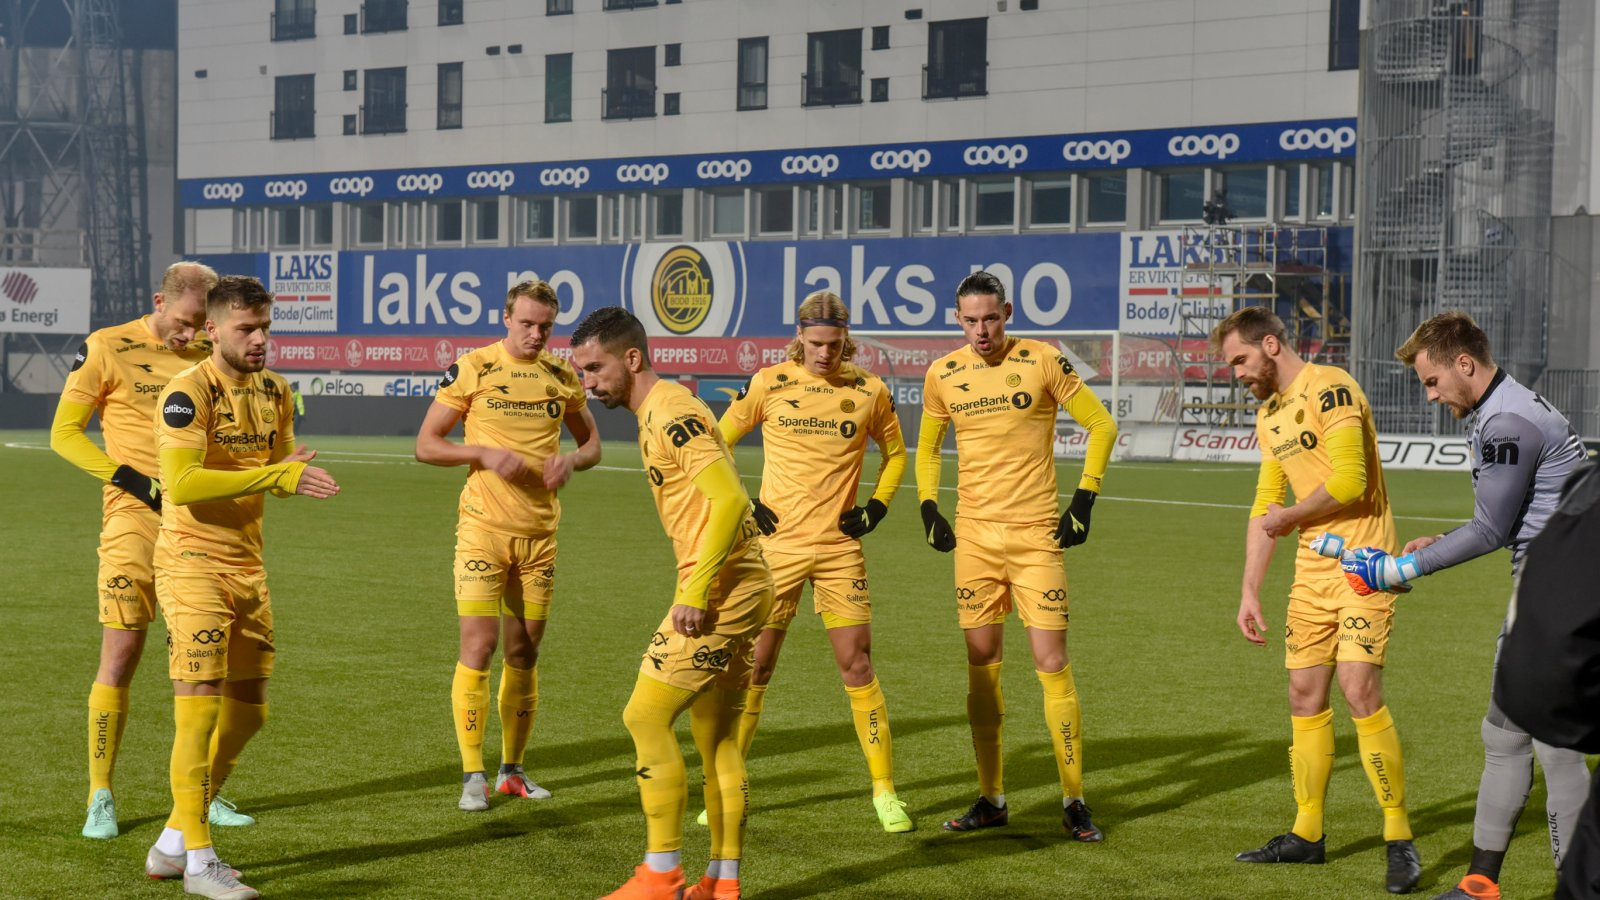 Bodø/Glimt møtte Stabæk til kamp på Aspmyra 28. oktober.